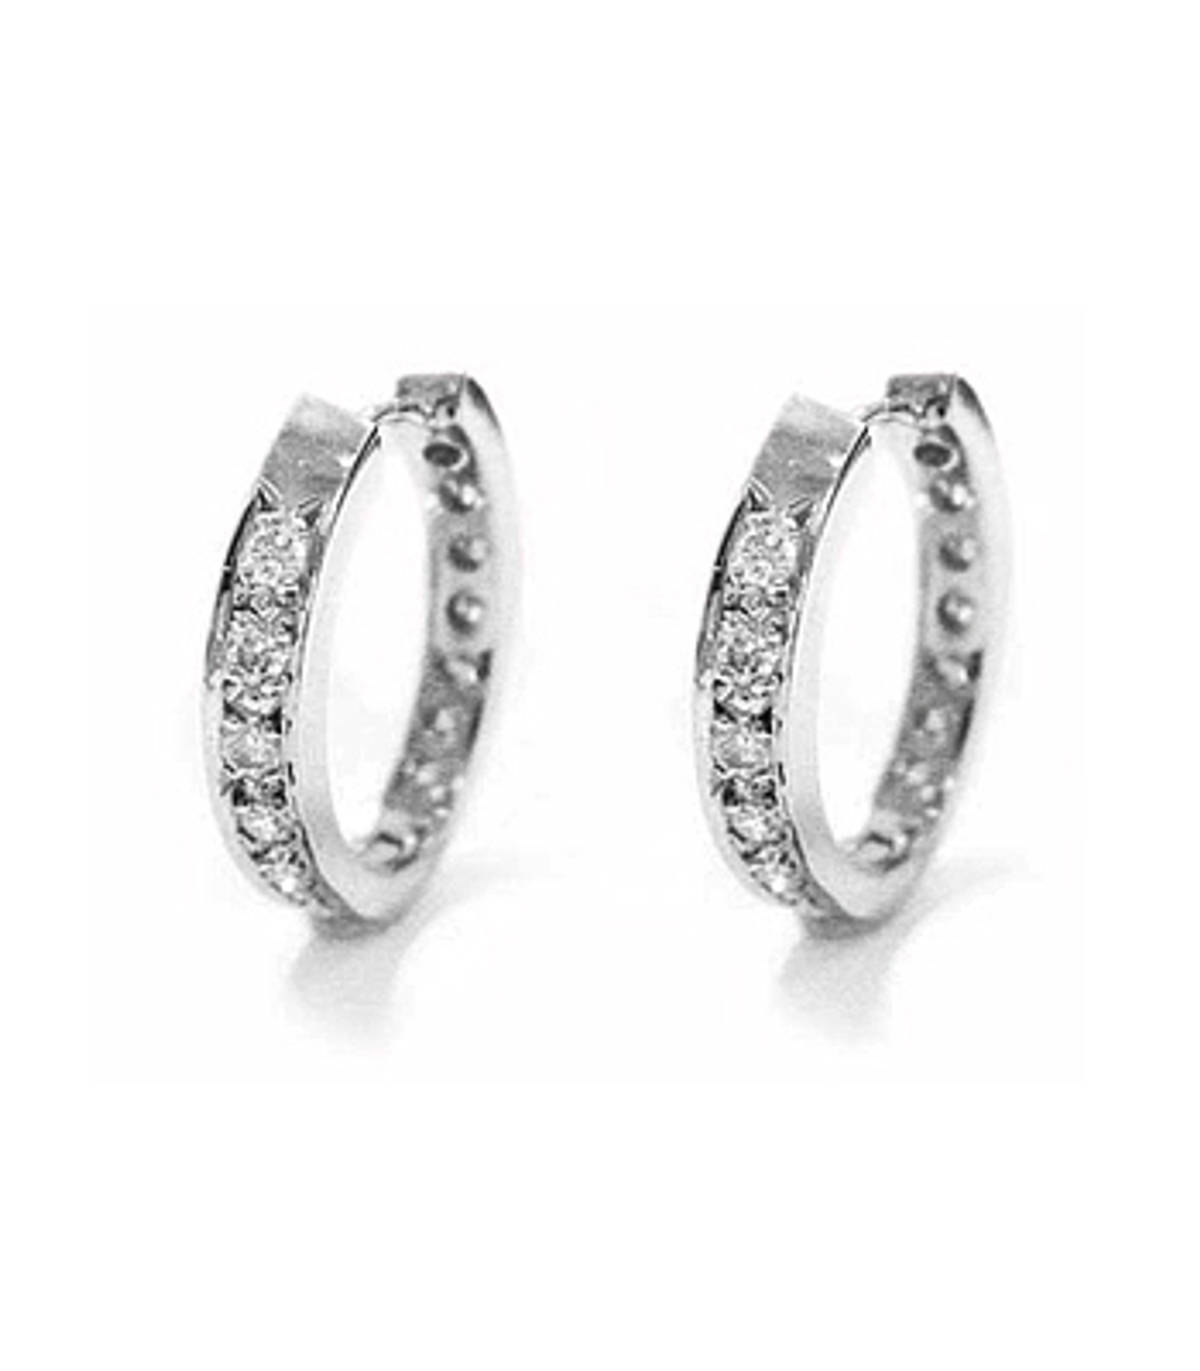 18k white gold brilliant cut diamond hoop earringsDETAILSCarat: total diamond weight 1.17ctsCut: Brilliant cutMetal: 18k white gold Made in Ireland